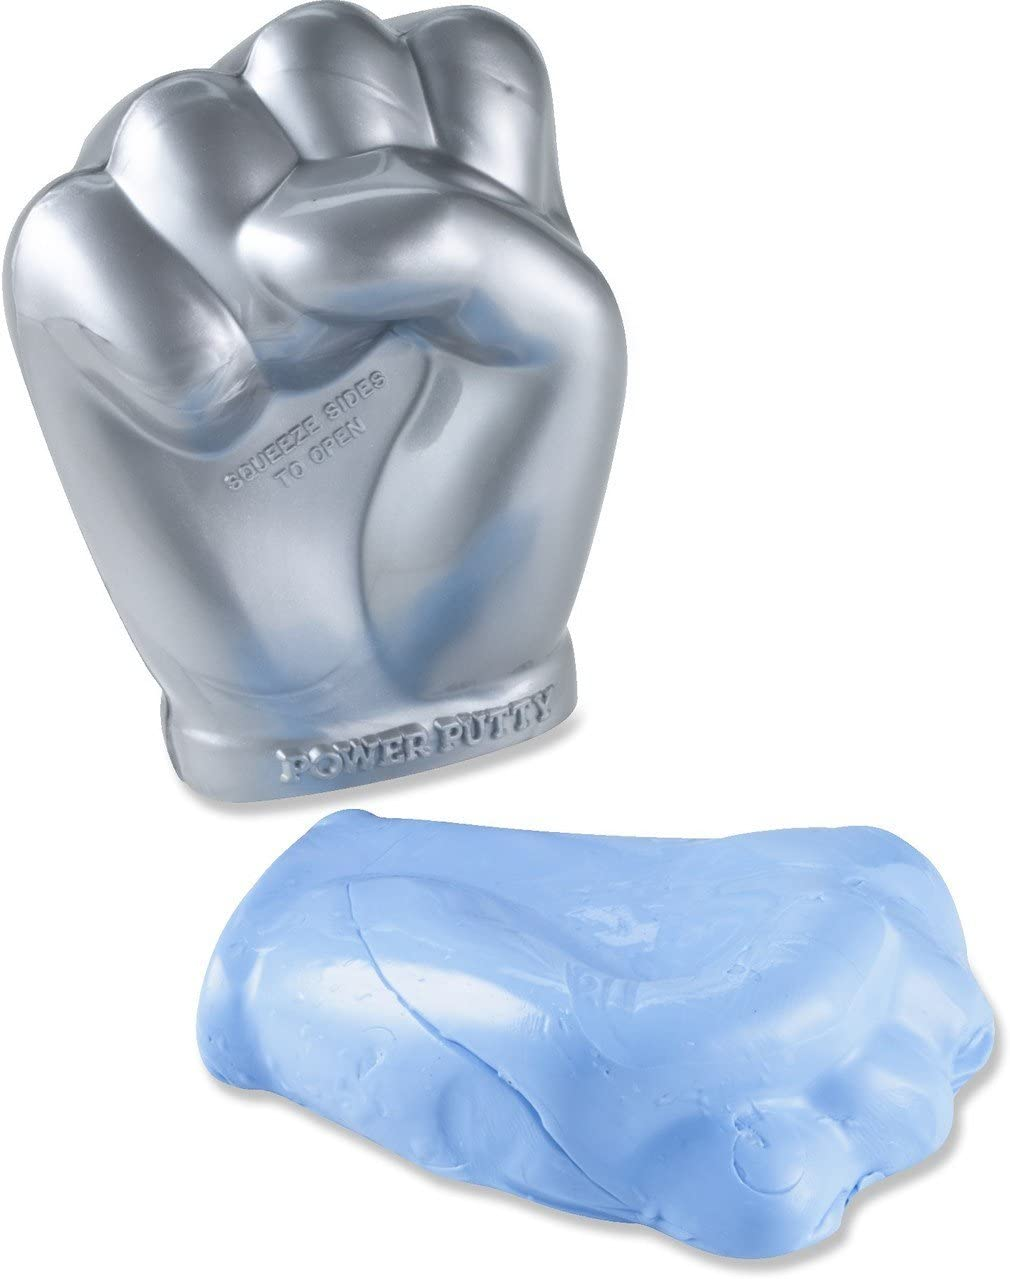 Power Putty Grip Strengthening and Hand Rehabilitation Medium